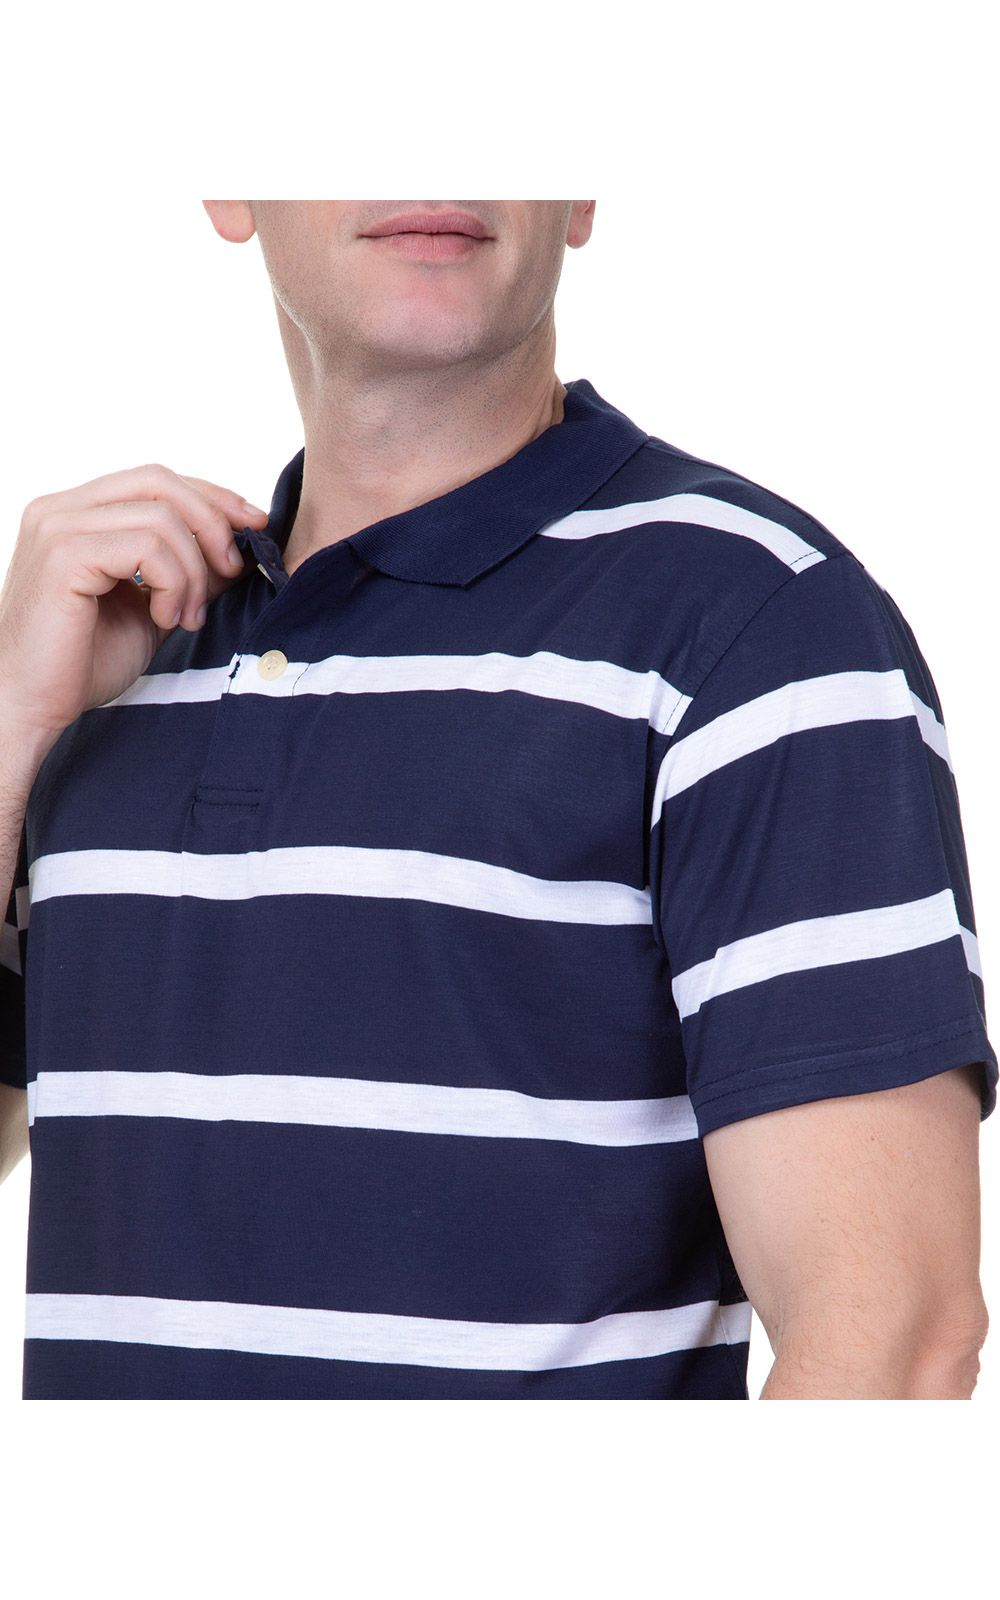 Foto 3 - Camisa Polo Masculina Azul Marinho Listrada